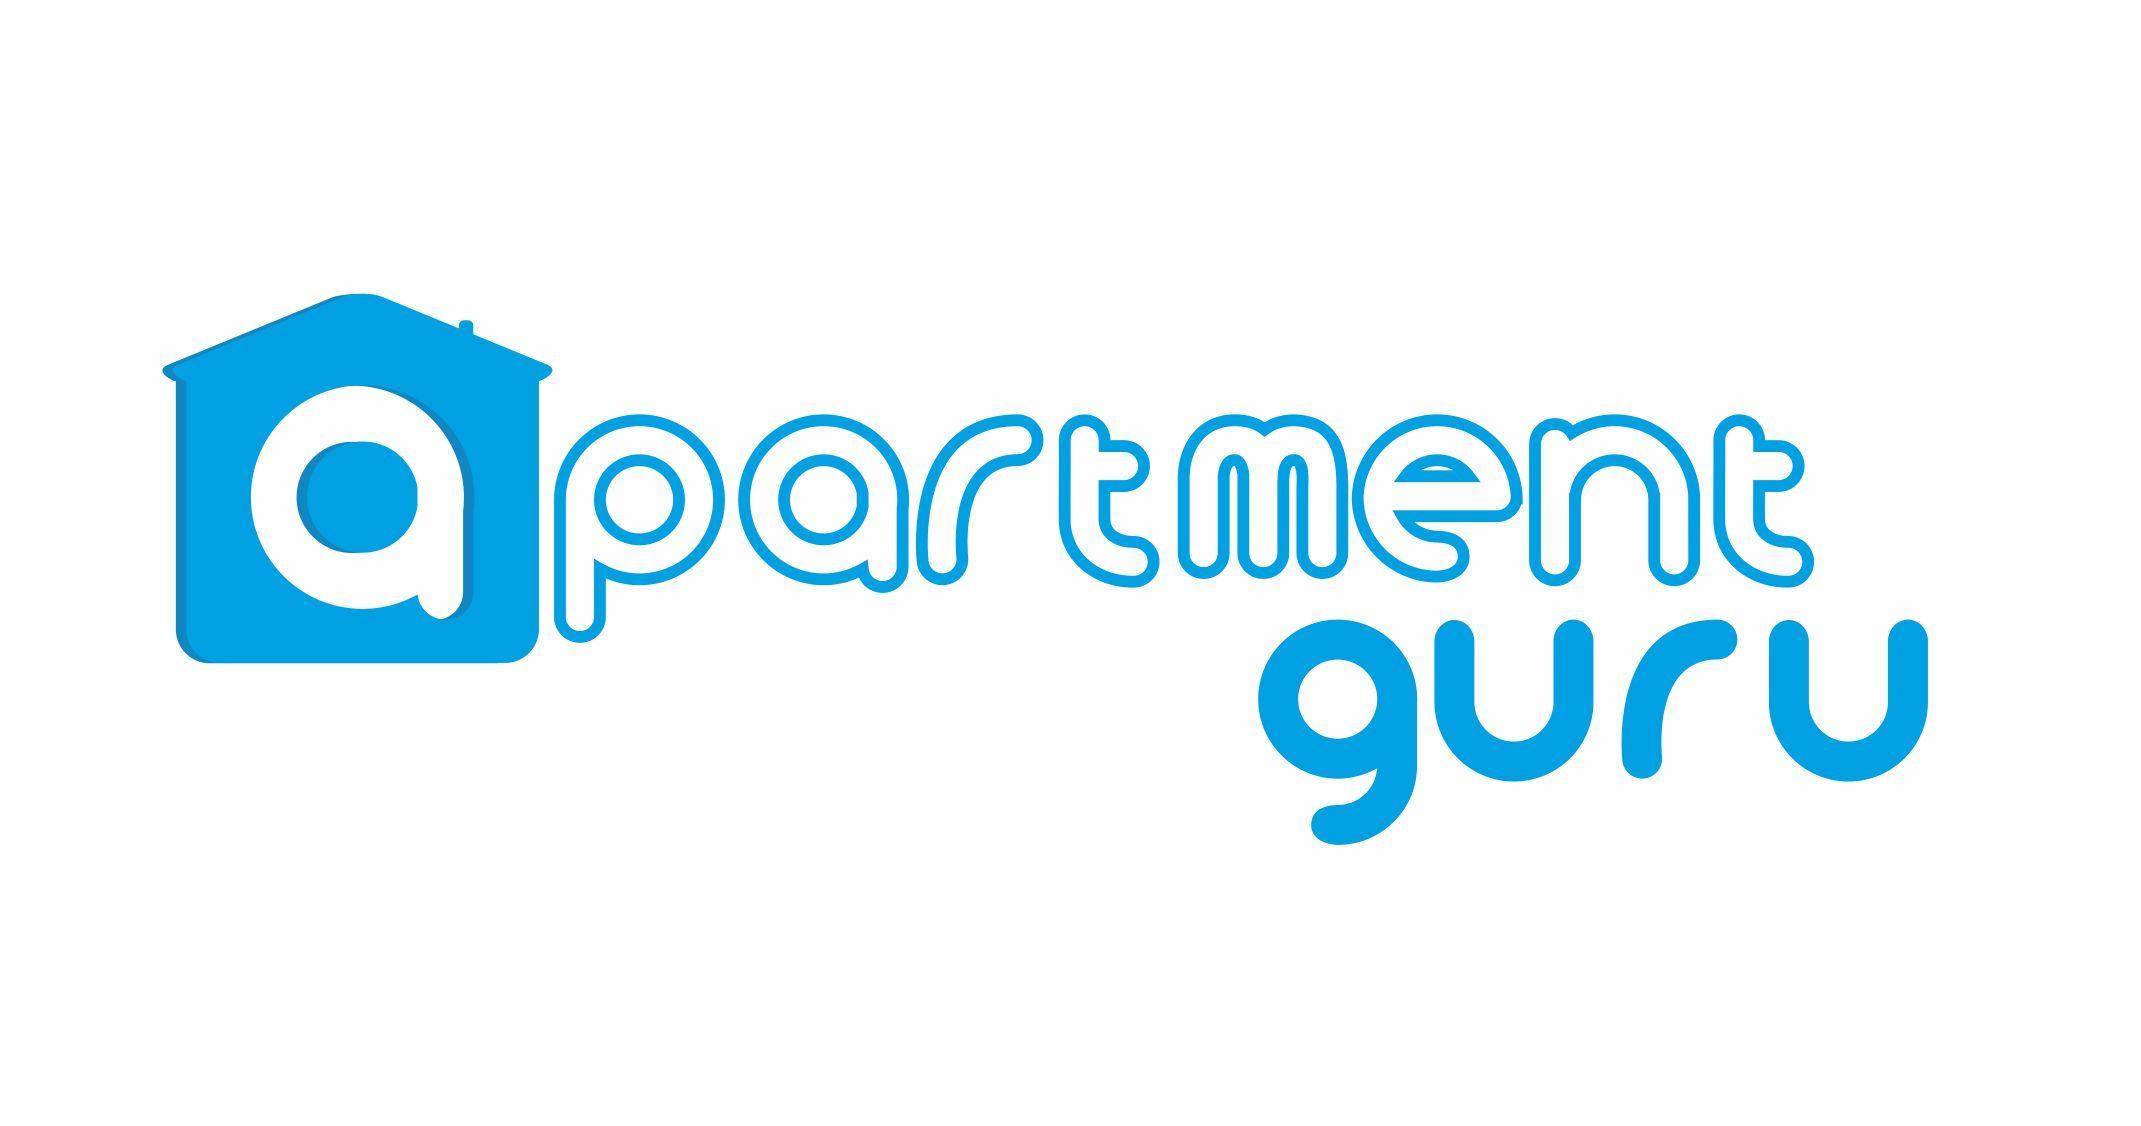 Дизайн логотипа сайта apartment guru - дизайнер janezol